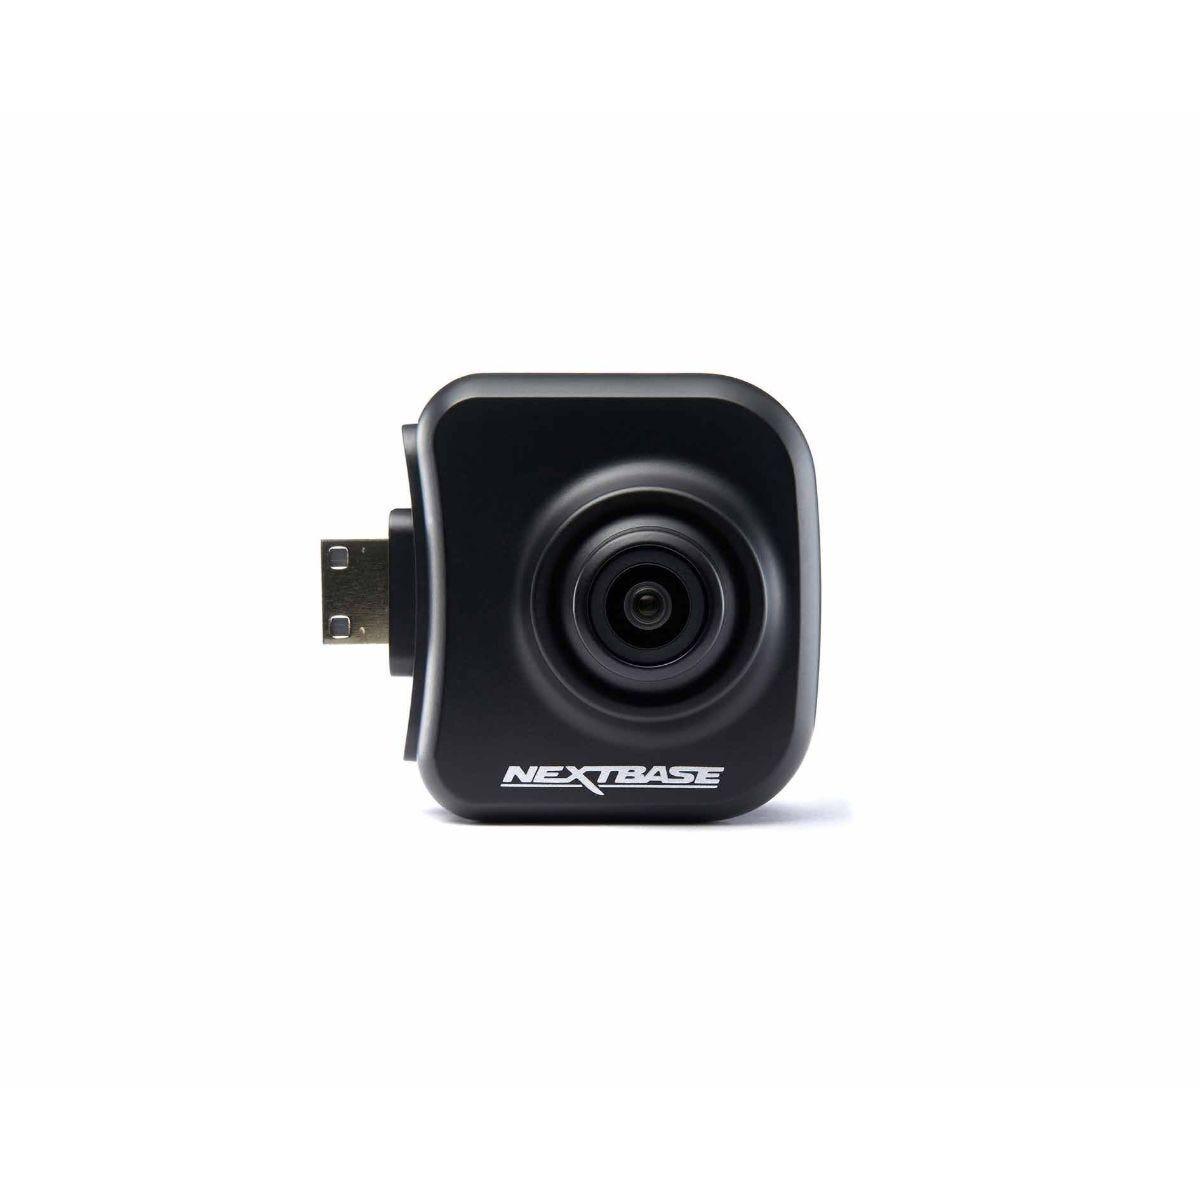 Nextbase NBDVRS2RFCZ Add-On Rear View Camera 1080p